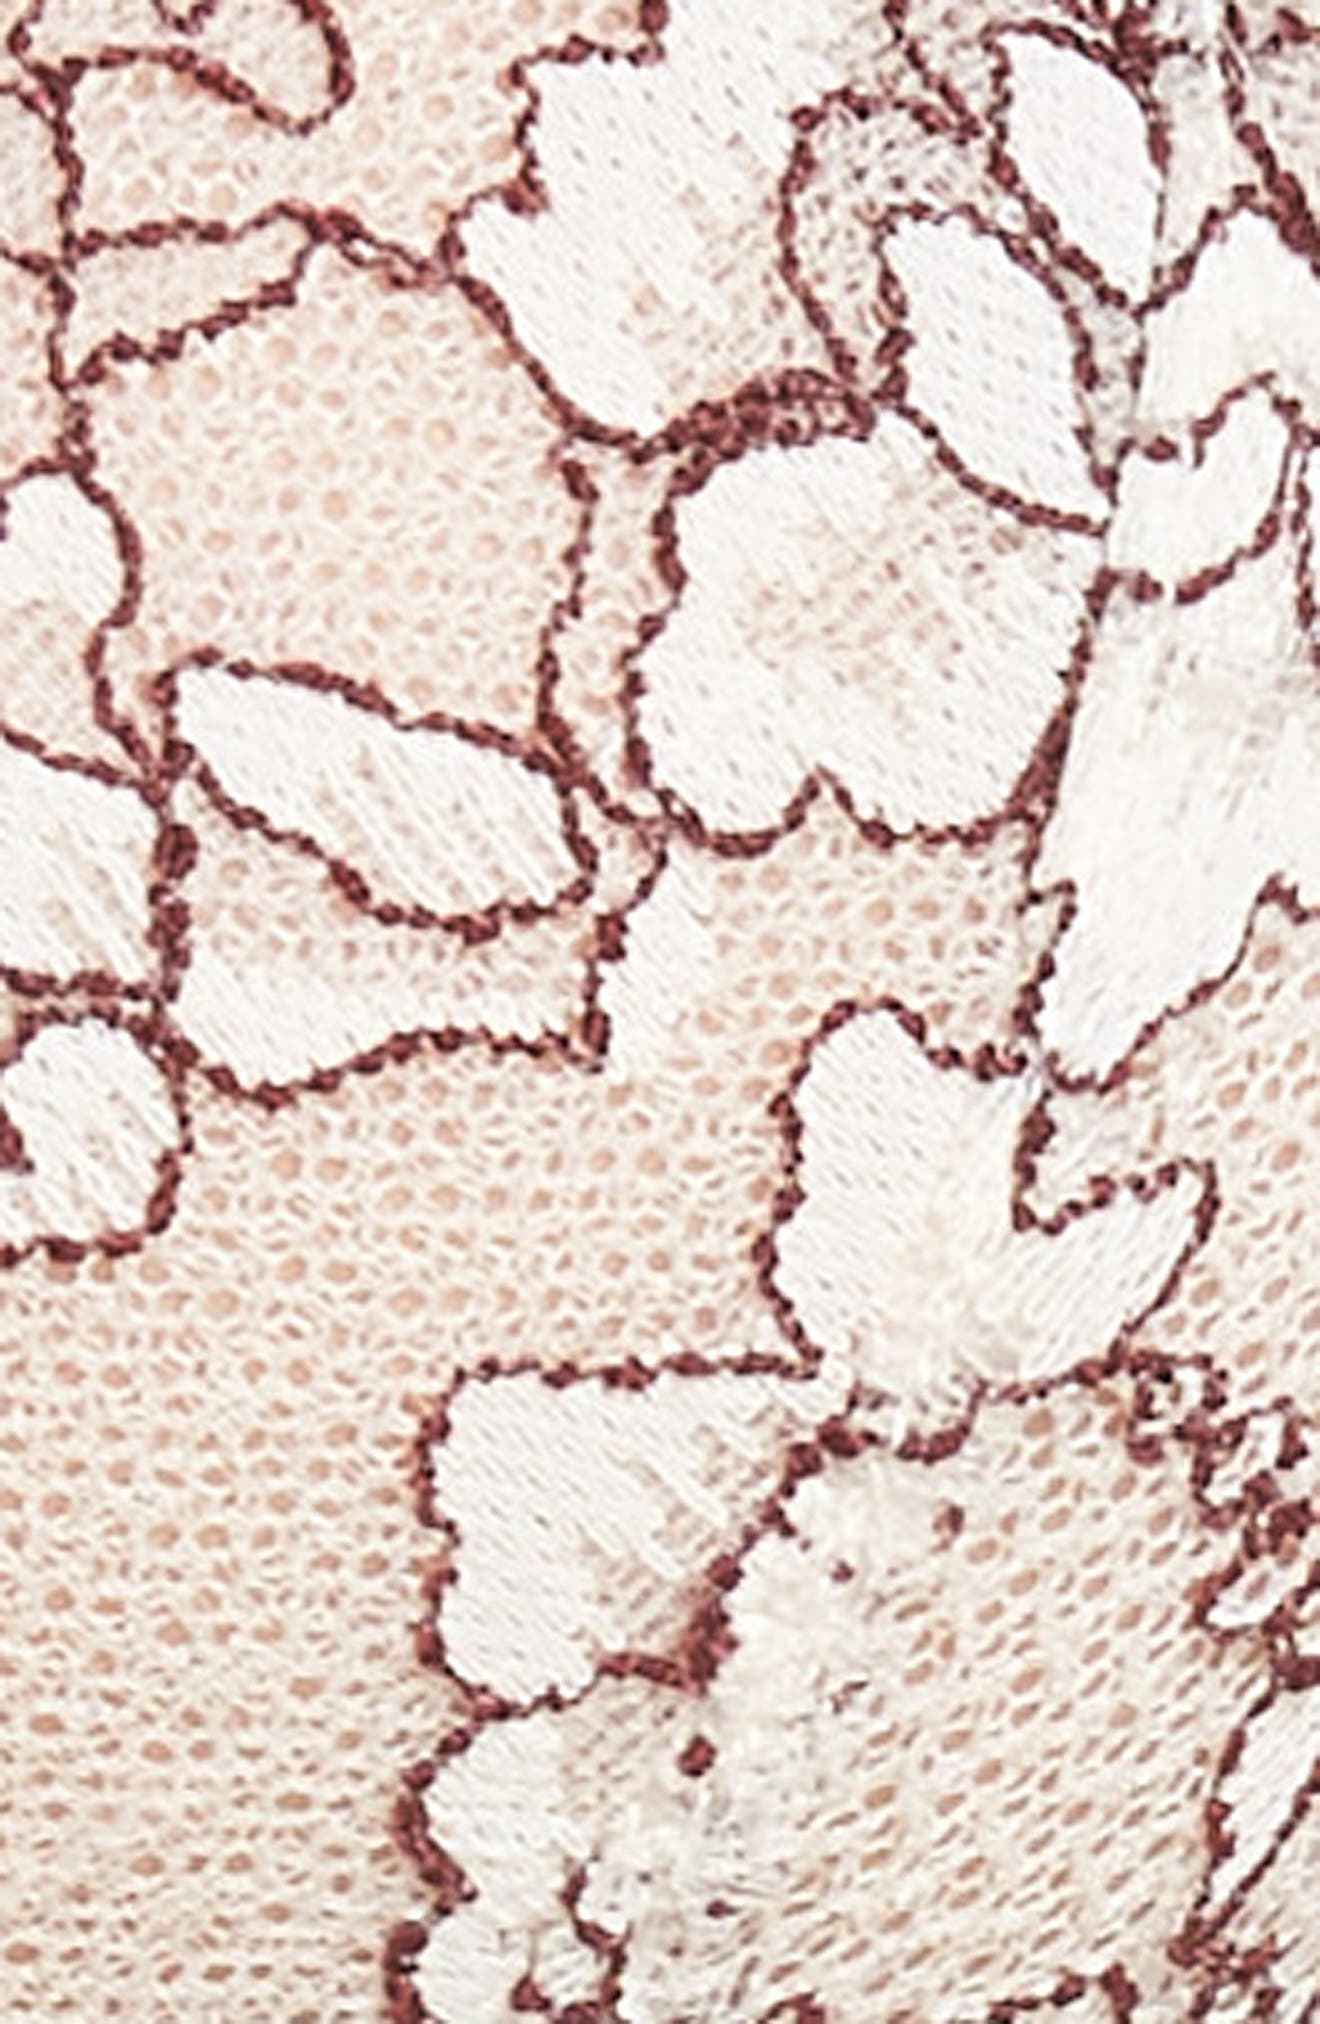 'Minx' Unlined Lace Demi Underwire Bra,                             Alternate thumbnail 6, color,                             MERINGUE/ BRICK